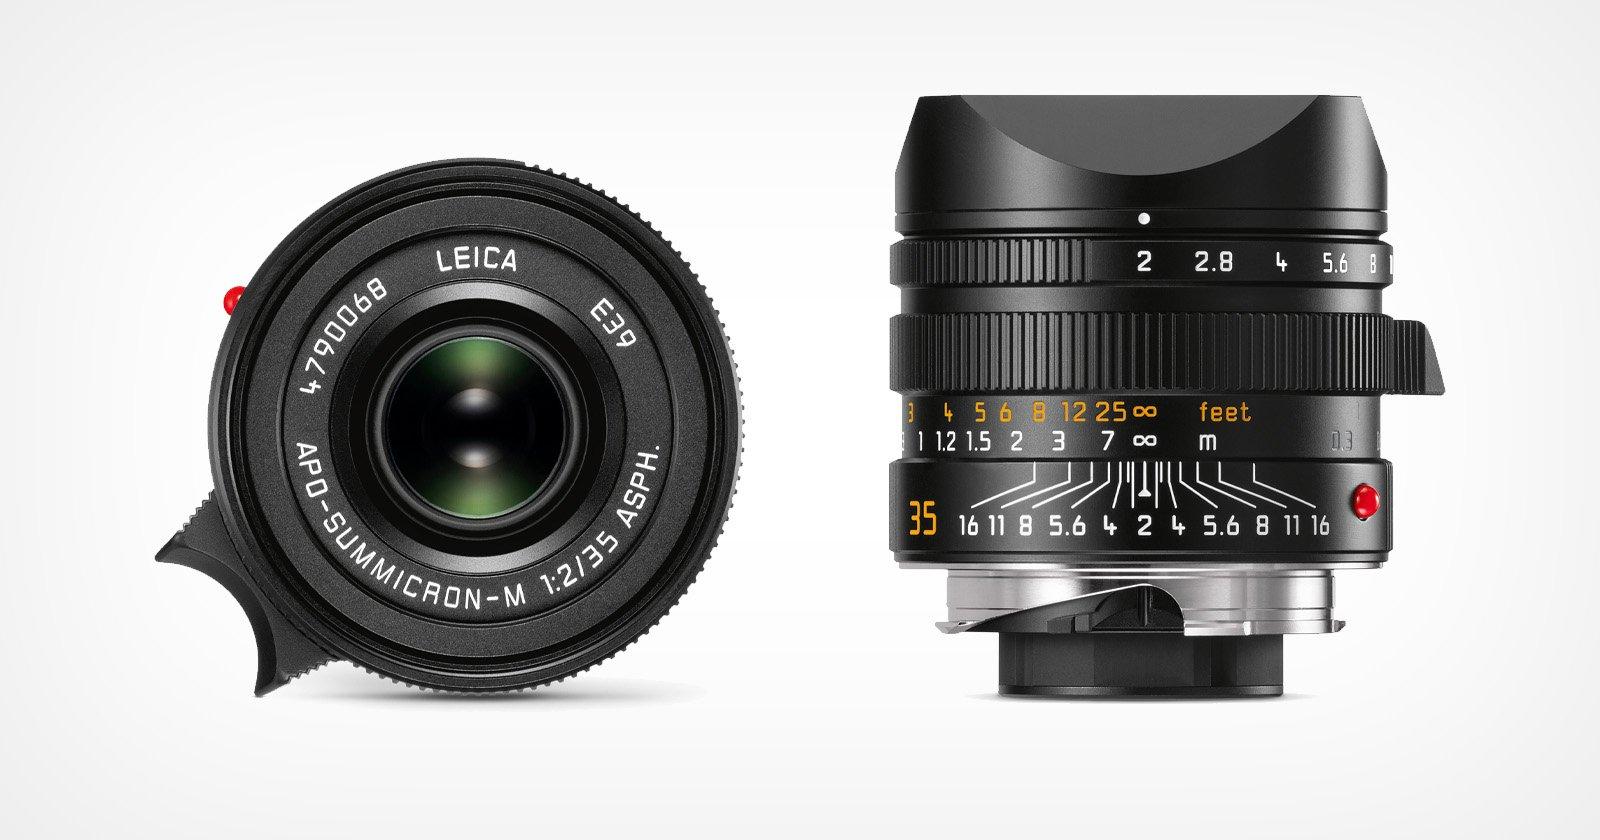 Leica Unveils the APO Summicron-M 35mm f/2 ASPH Lens